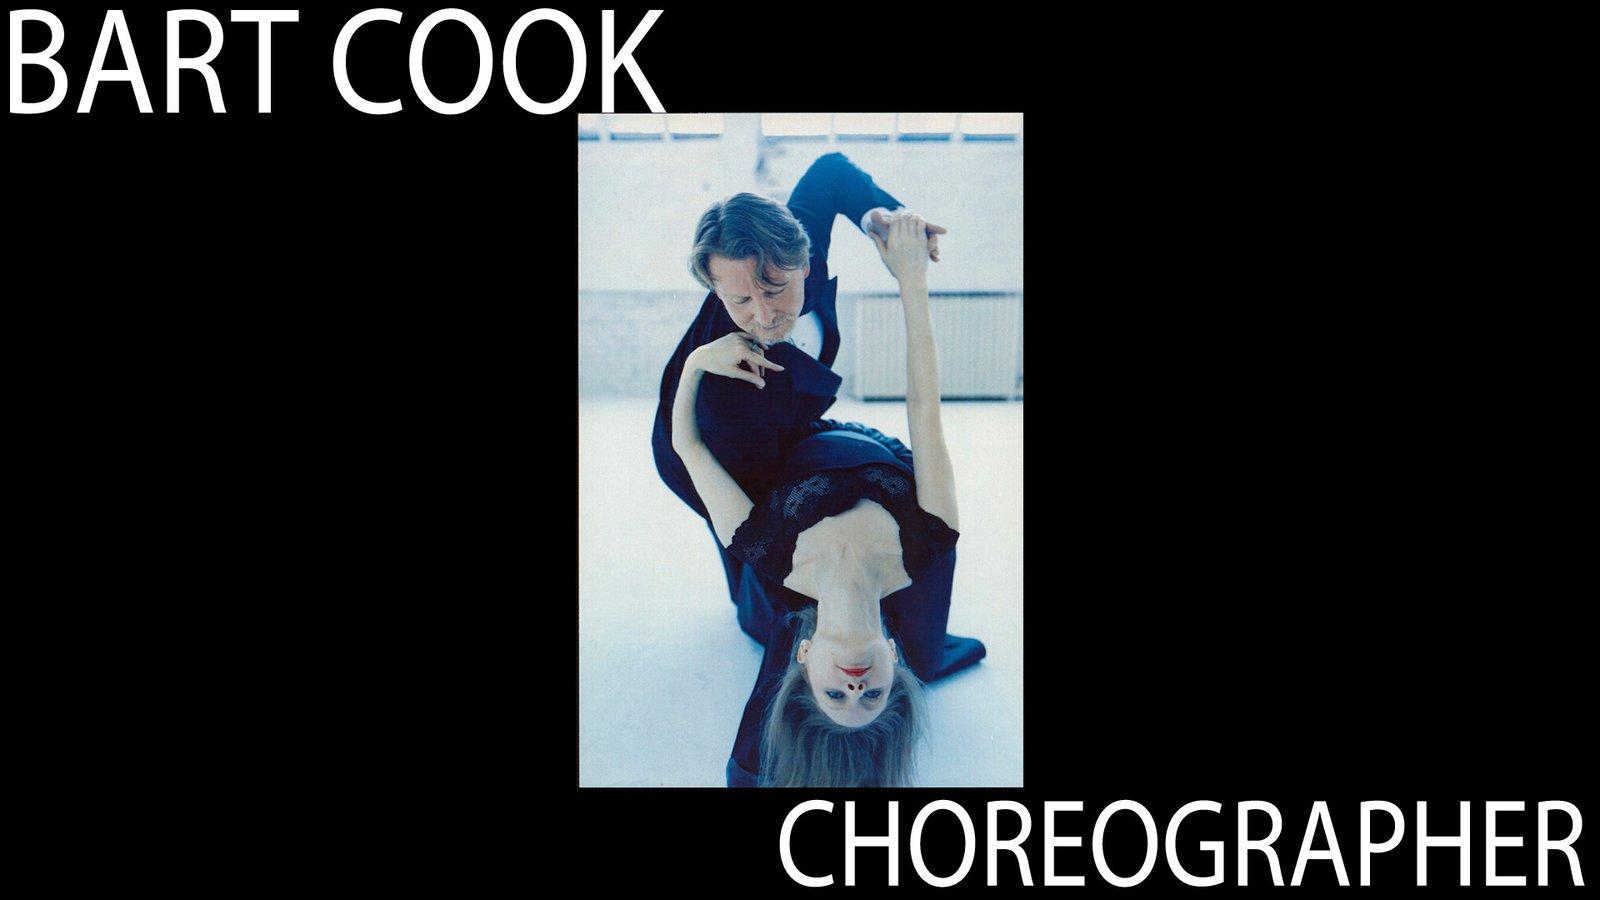 Bart Cook: Choreographer